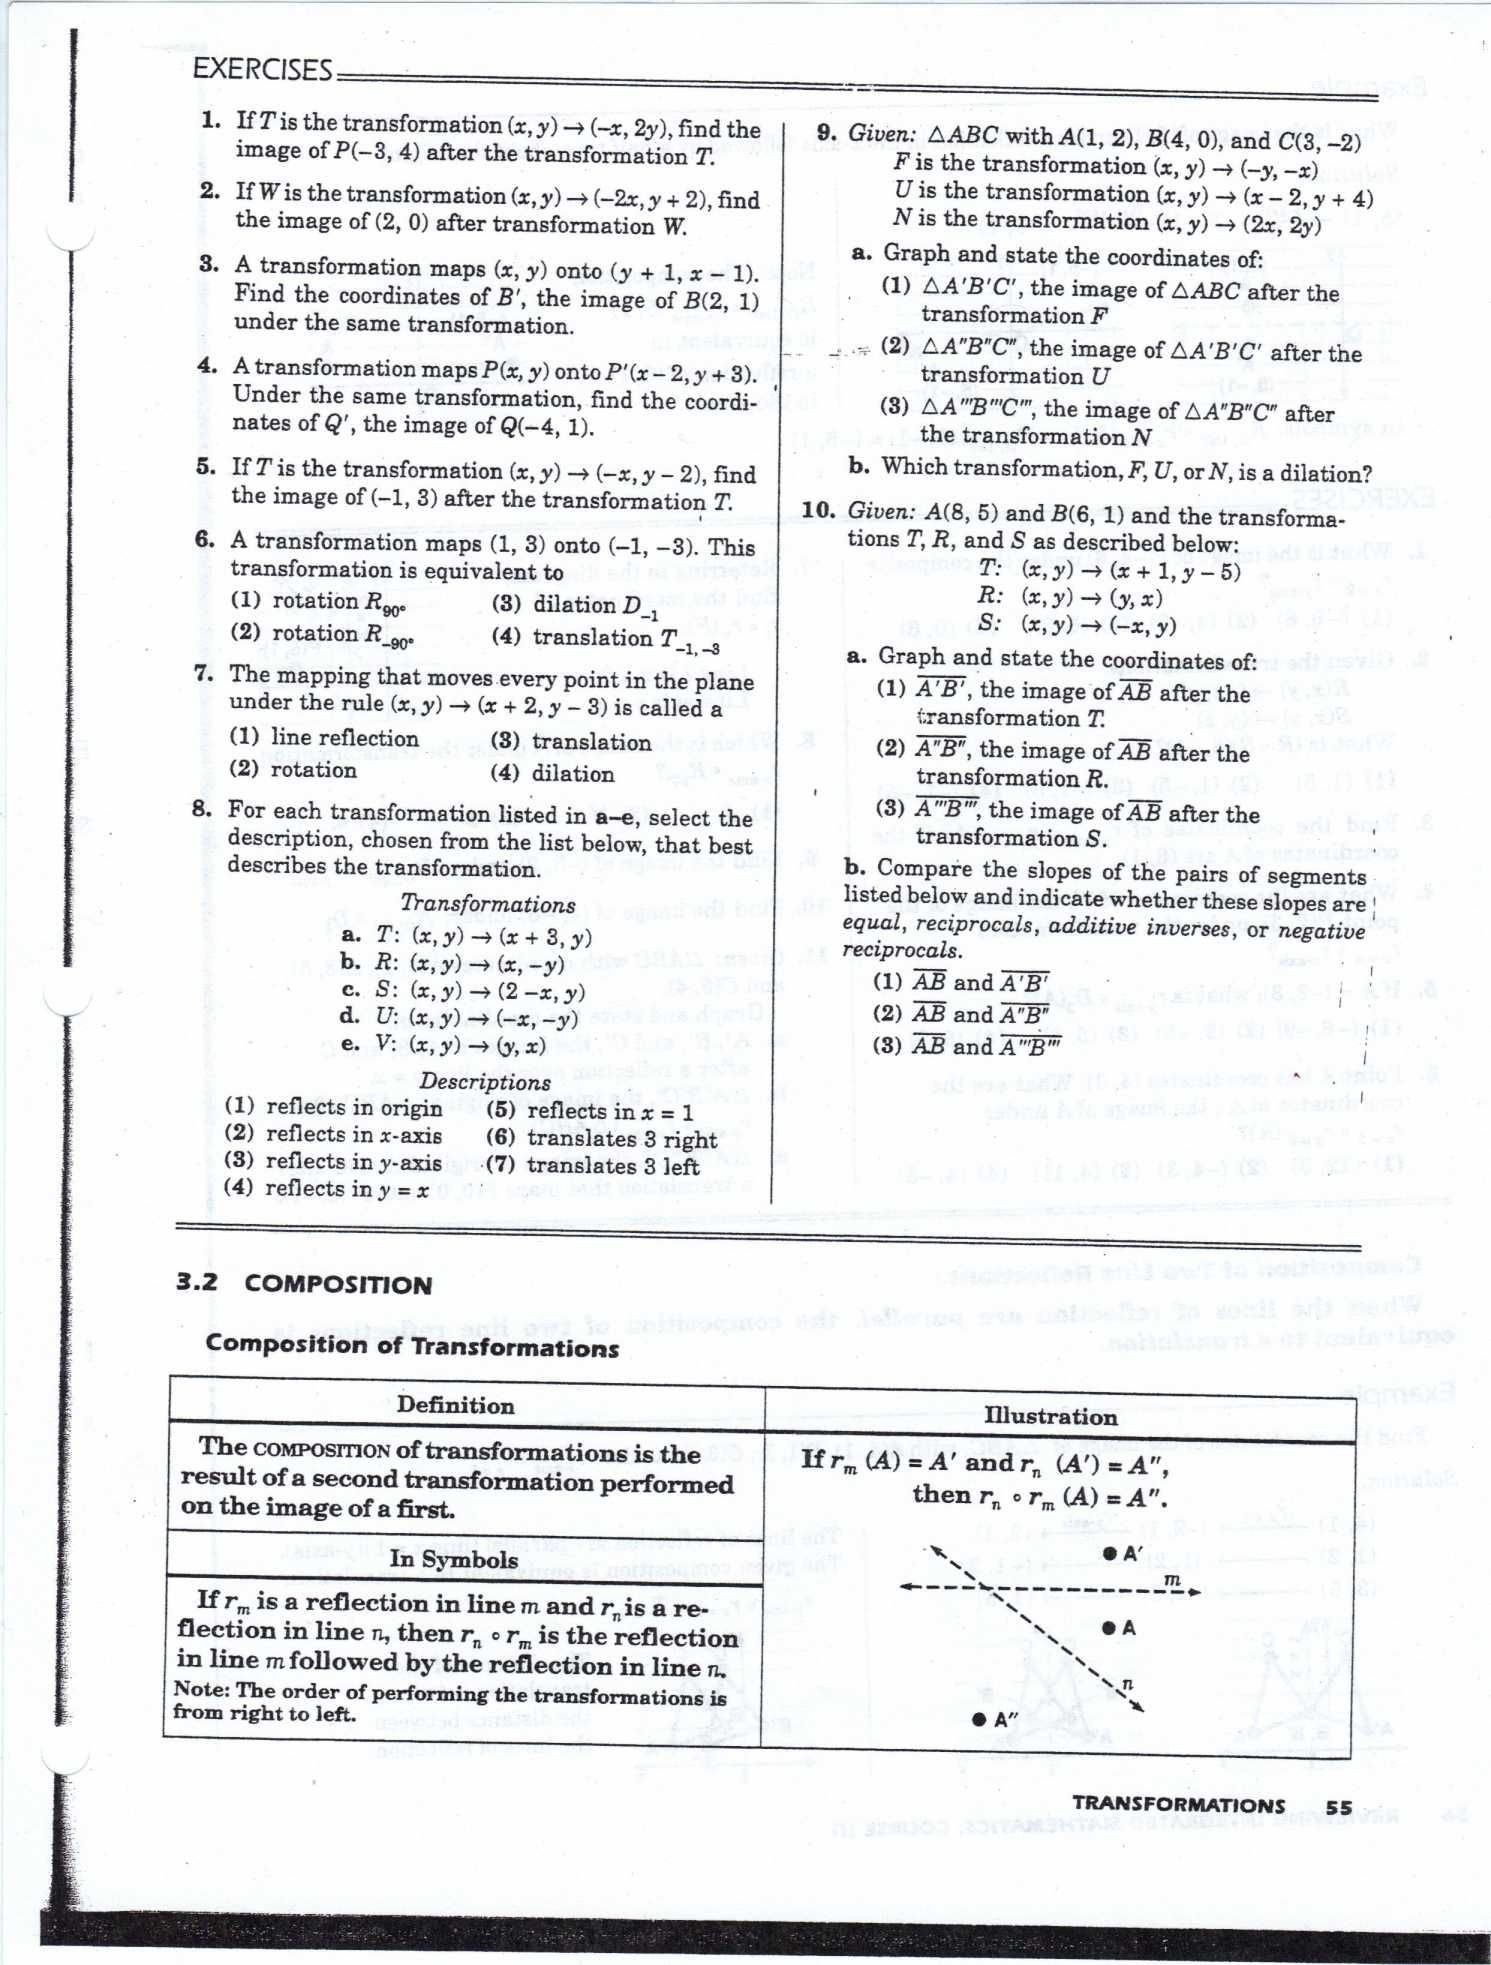 Geometry Transformation Composition Worksheet Answers Transformations Algebra 2 Worksheet Transforming In 2020 Algebra 2 Worksheets Pre Algebra Worksheets Quadratics